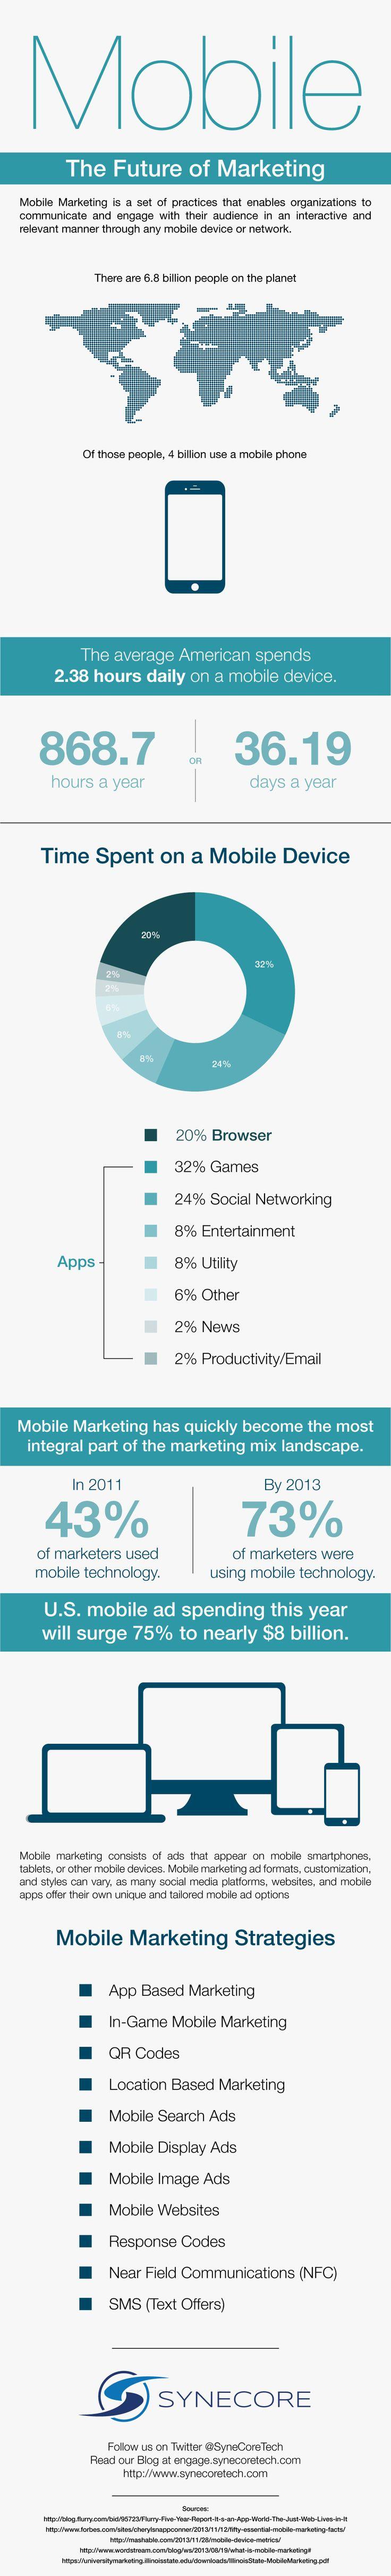 Mobile: The Future of Marketing   #infographic #Marketing #Mobile  Ideas Negocios Online para www.masymejor.com